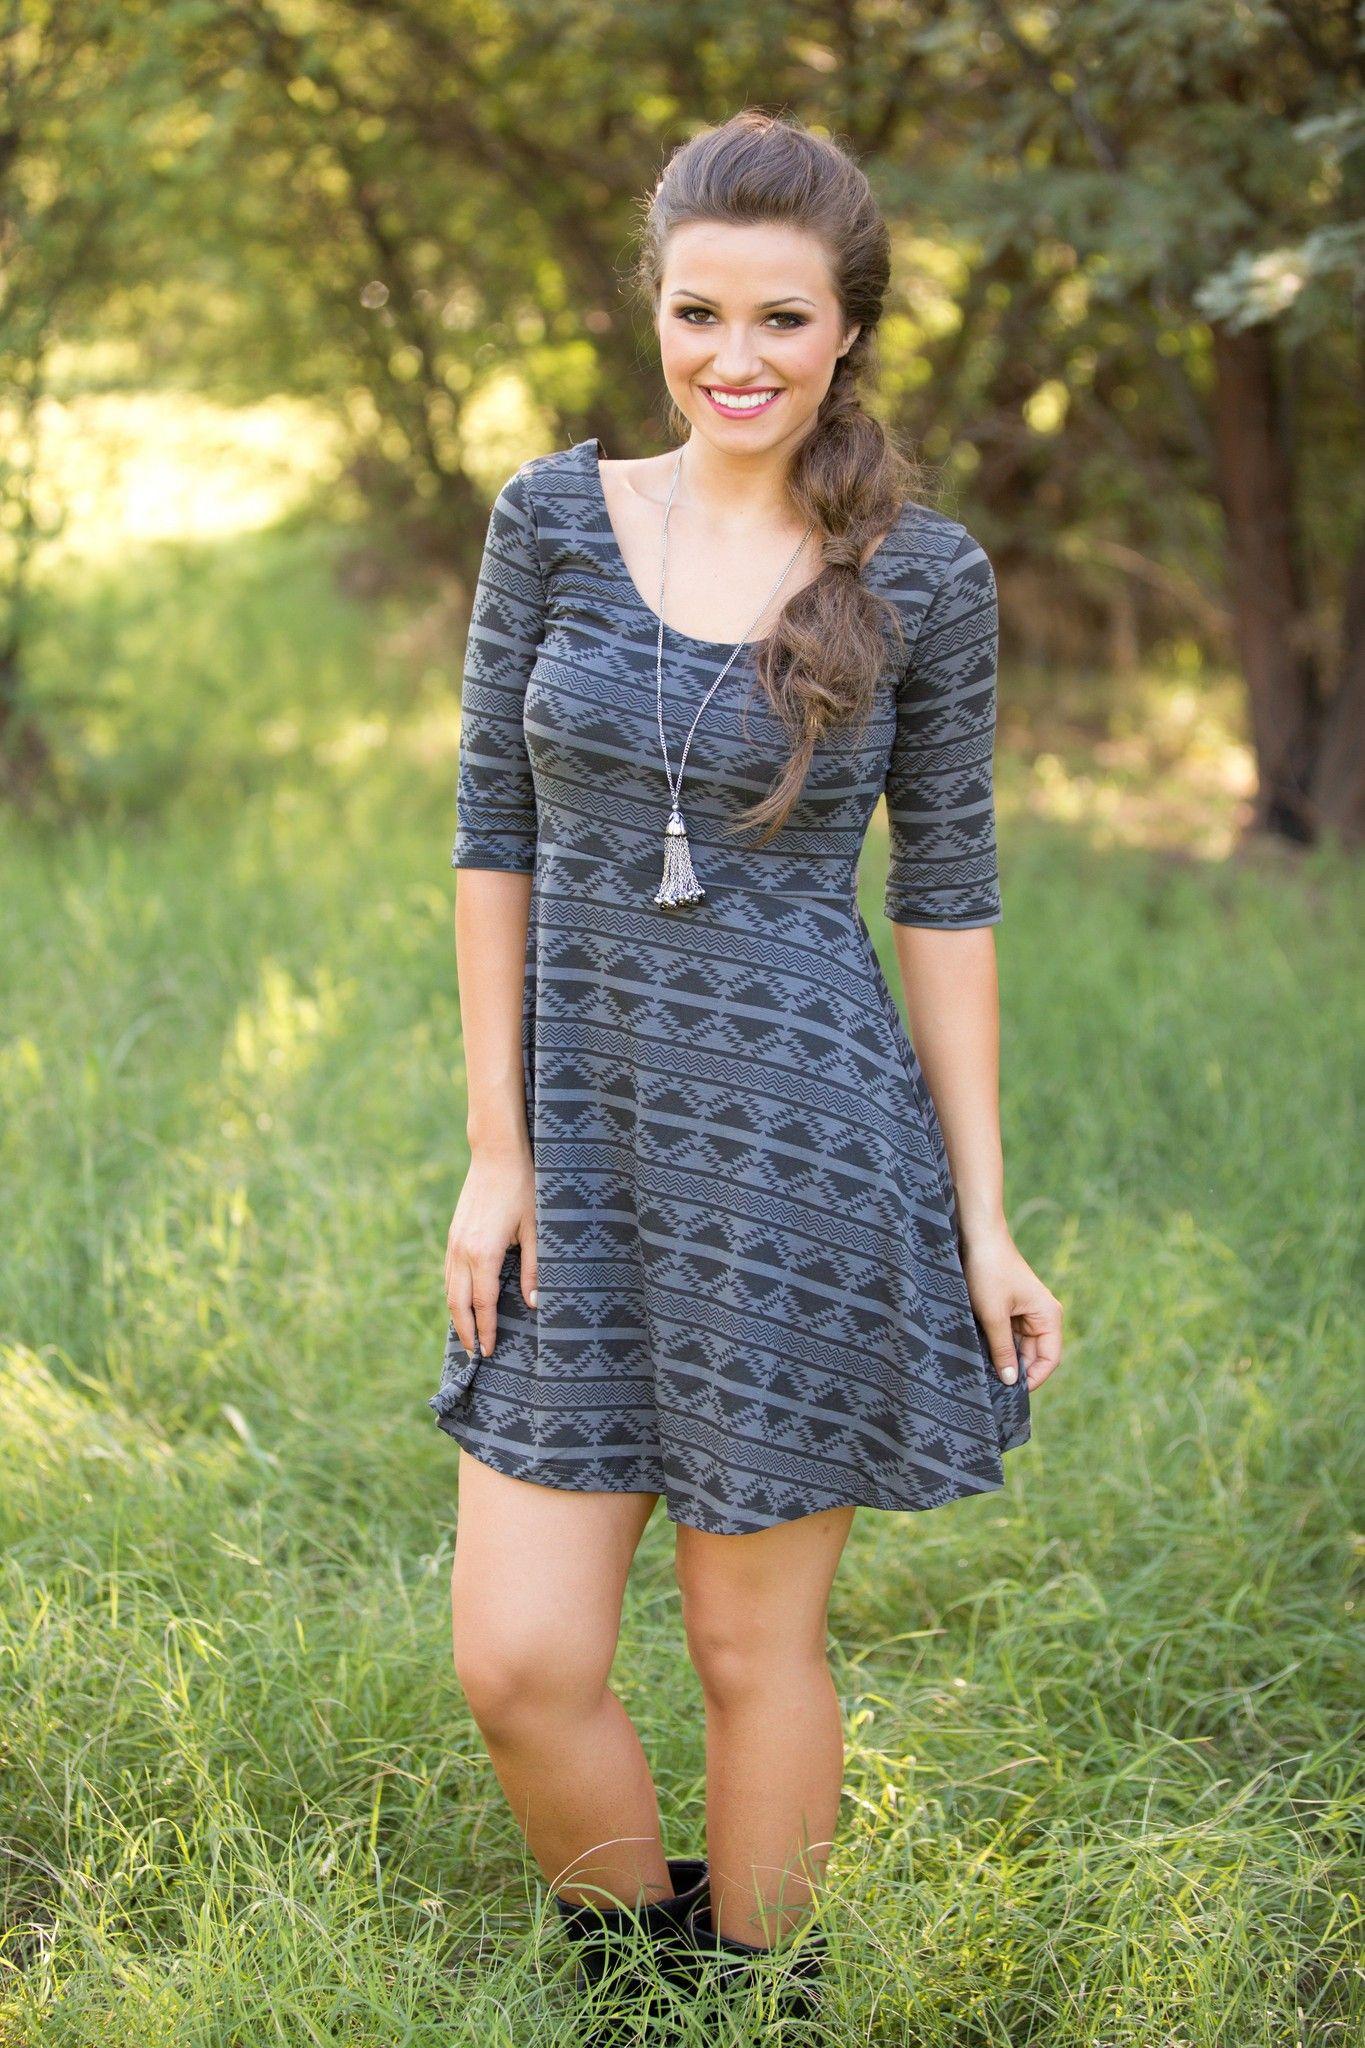 Gray Aztec Print 3/4 Sleeve Skater Dress | USTrendy// #ustrendy #black #gray #aztec #skater #dress